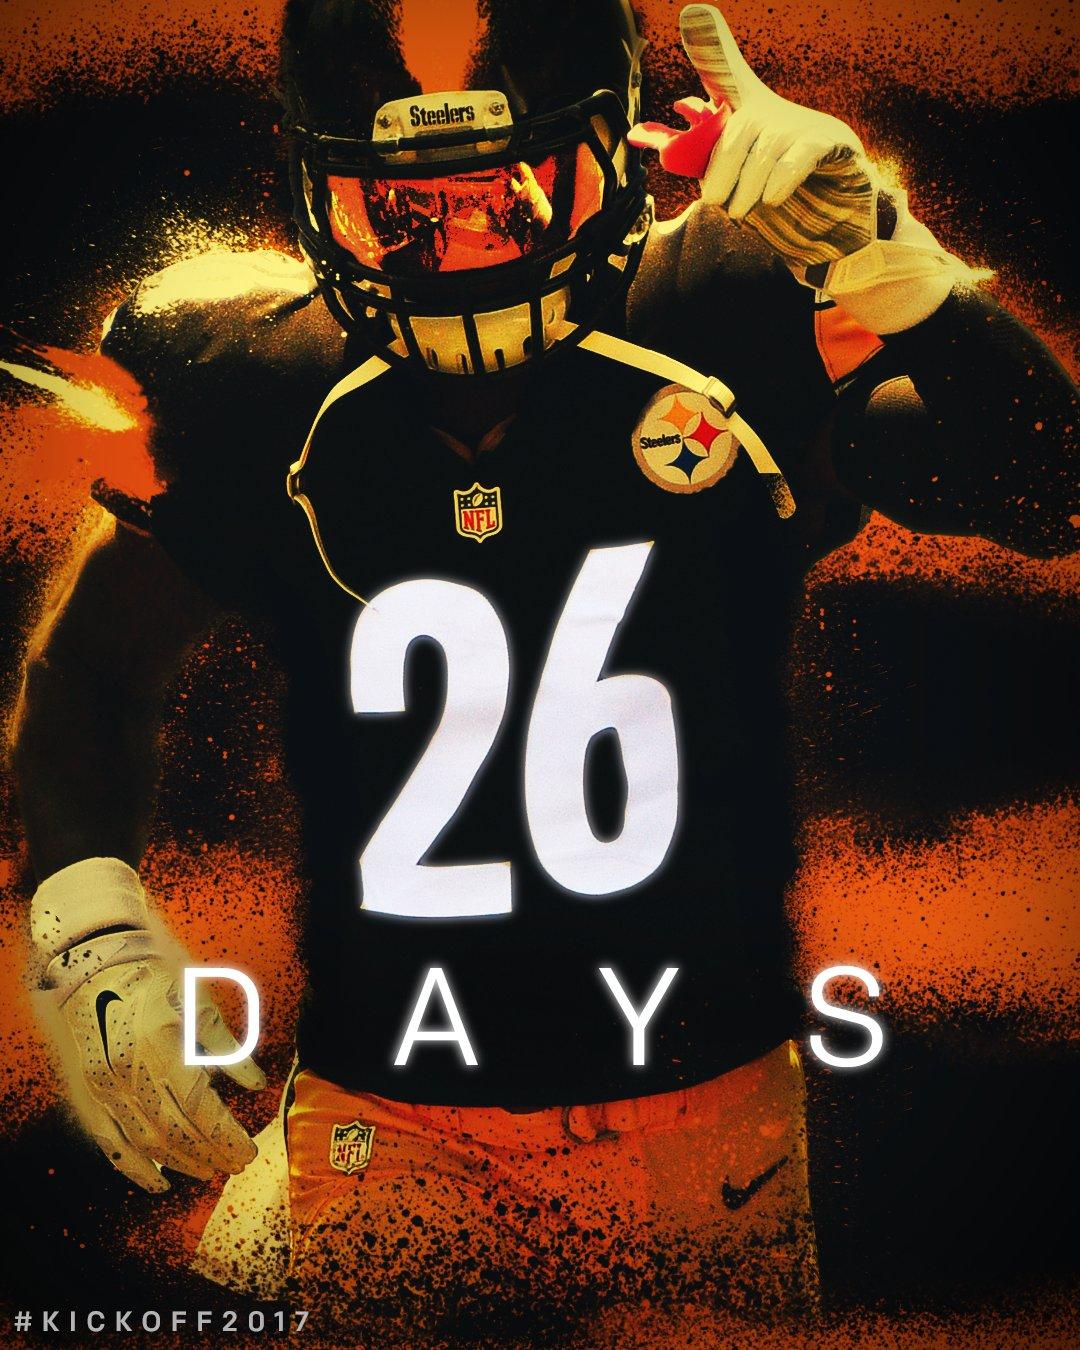 In 26 days...  ������ returns! #Kickoff2017 https://t.co/TATSM0nWGX